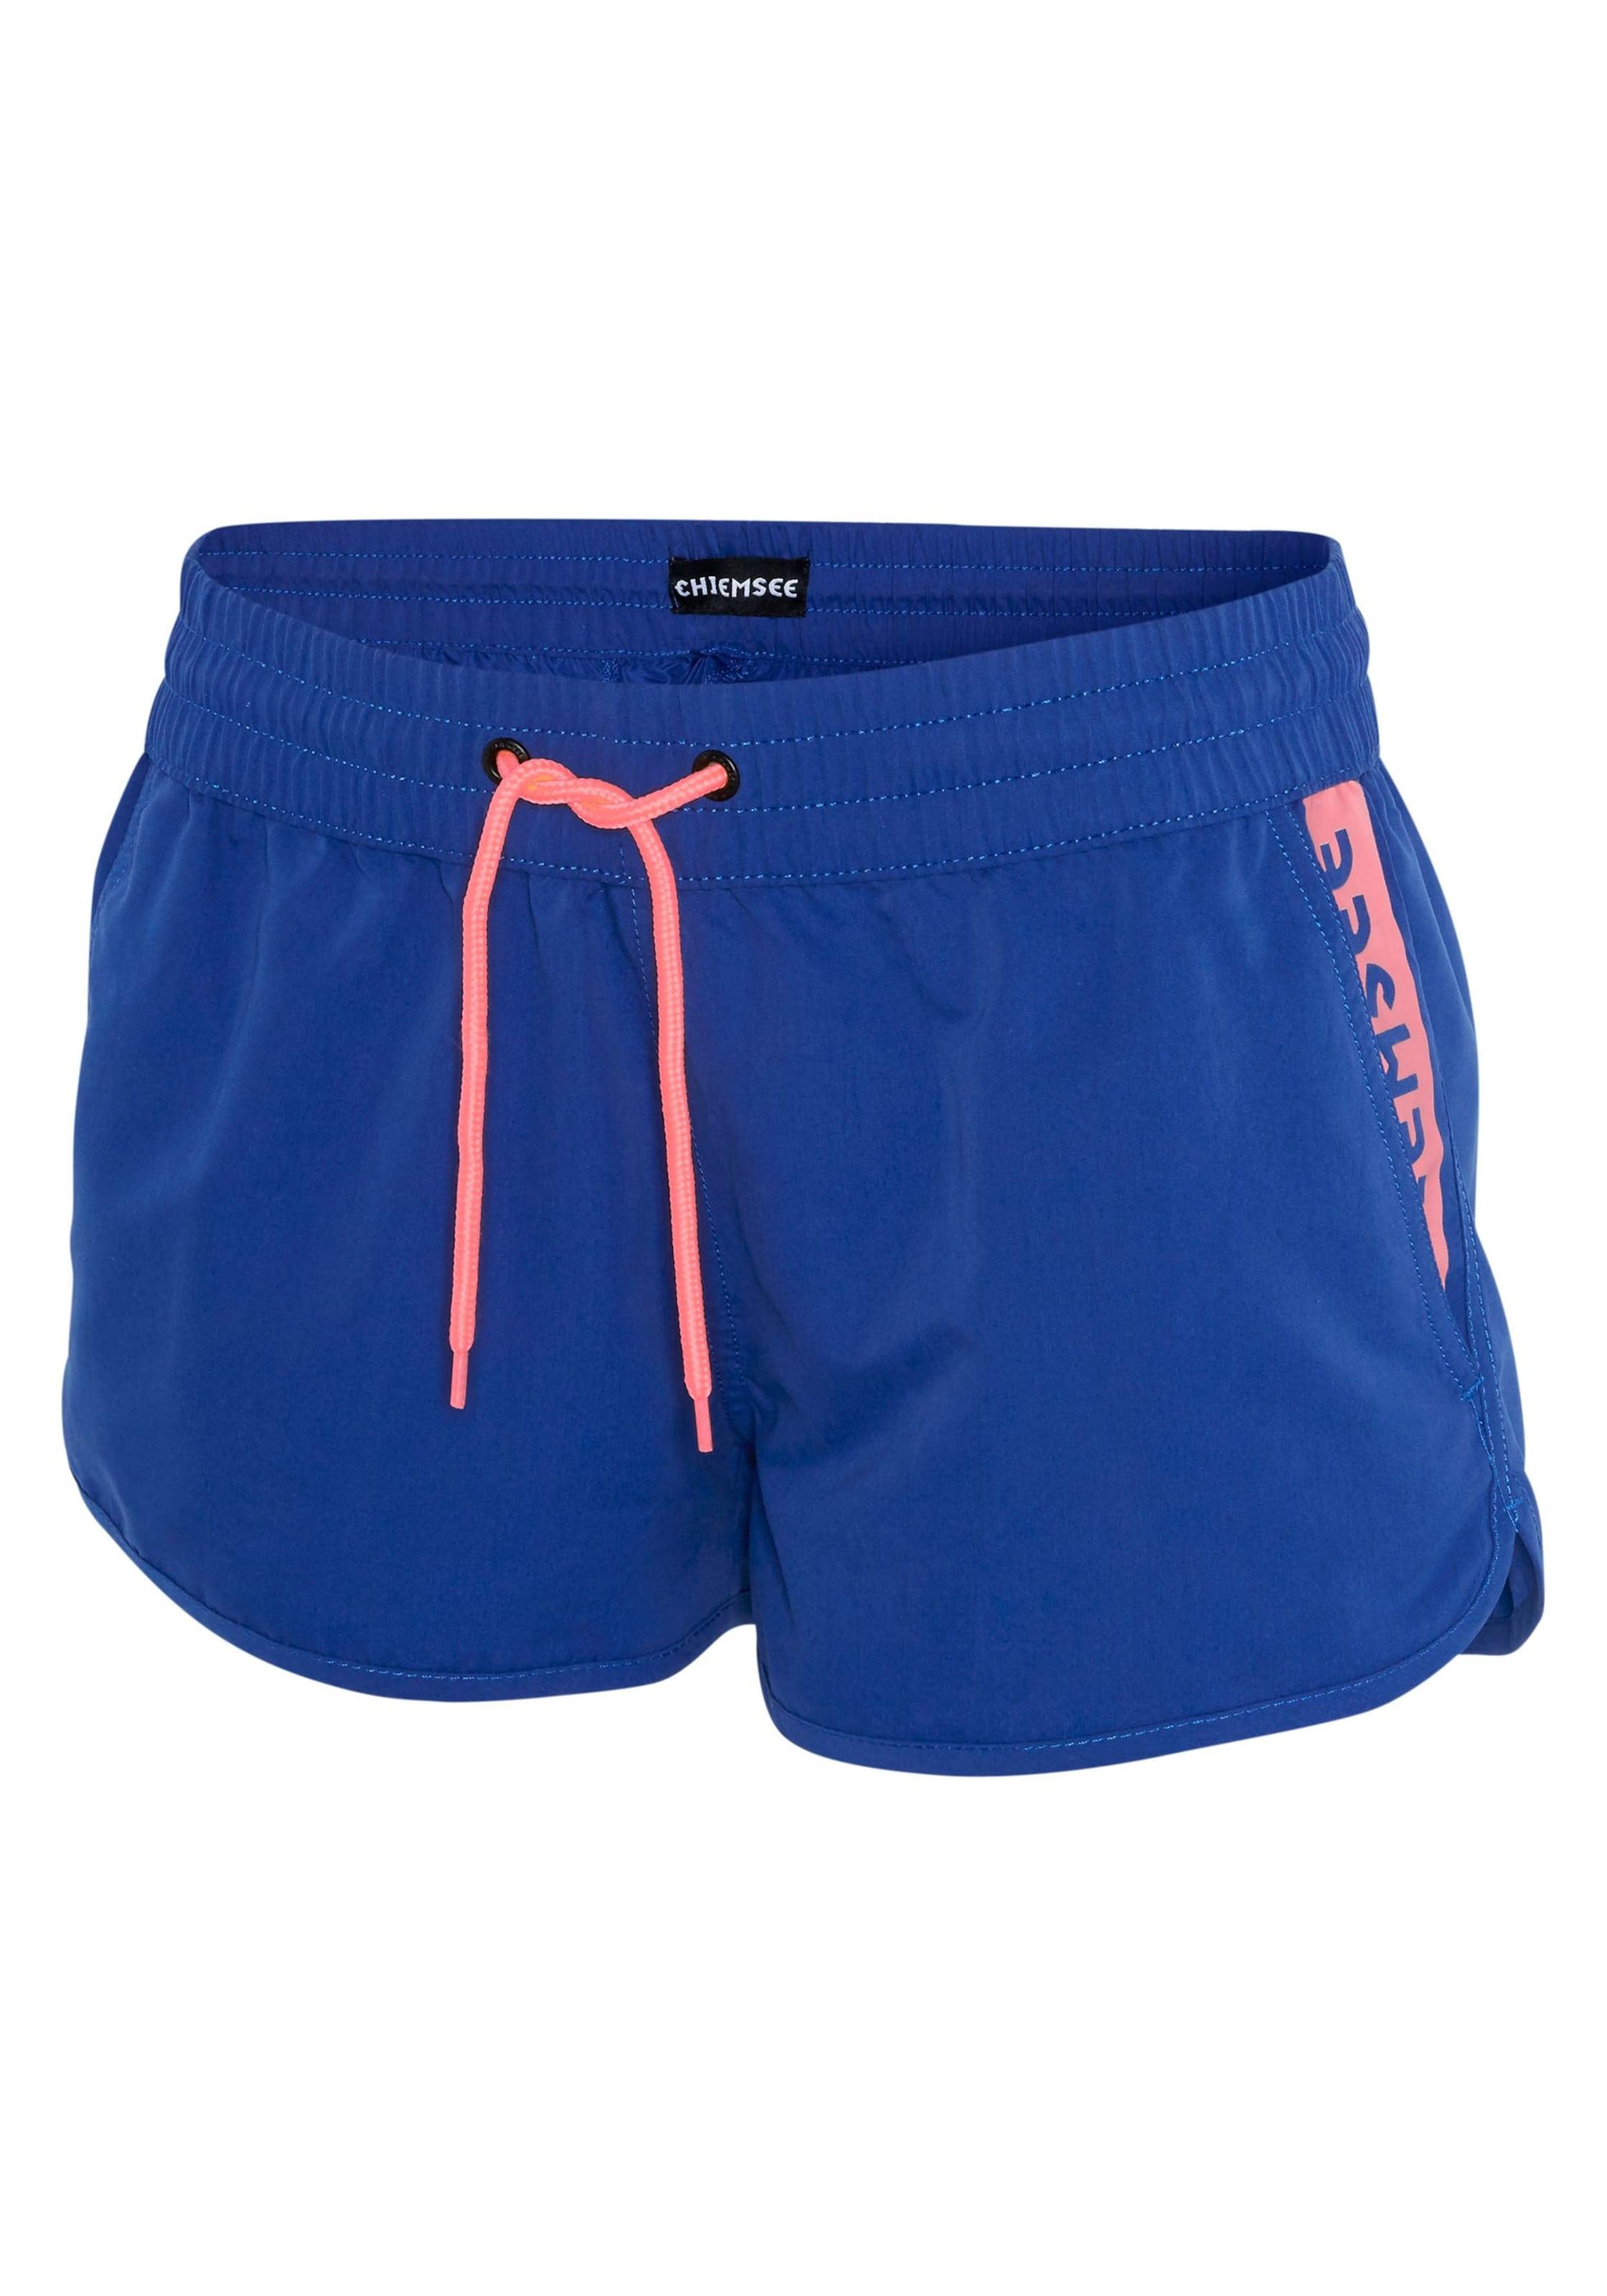 Shorts' Shorts Bain De 'gosina Bleu WomenSwim Chiemsee En I6fvgYb7y